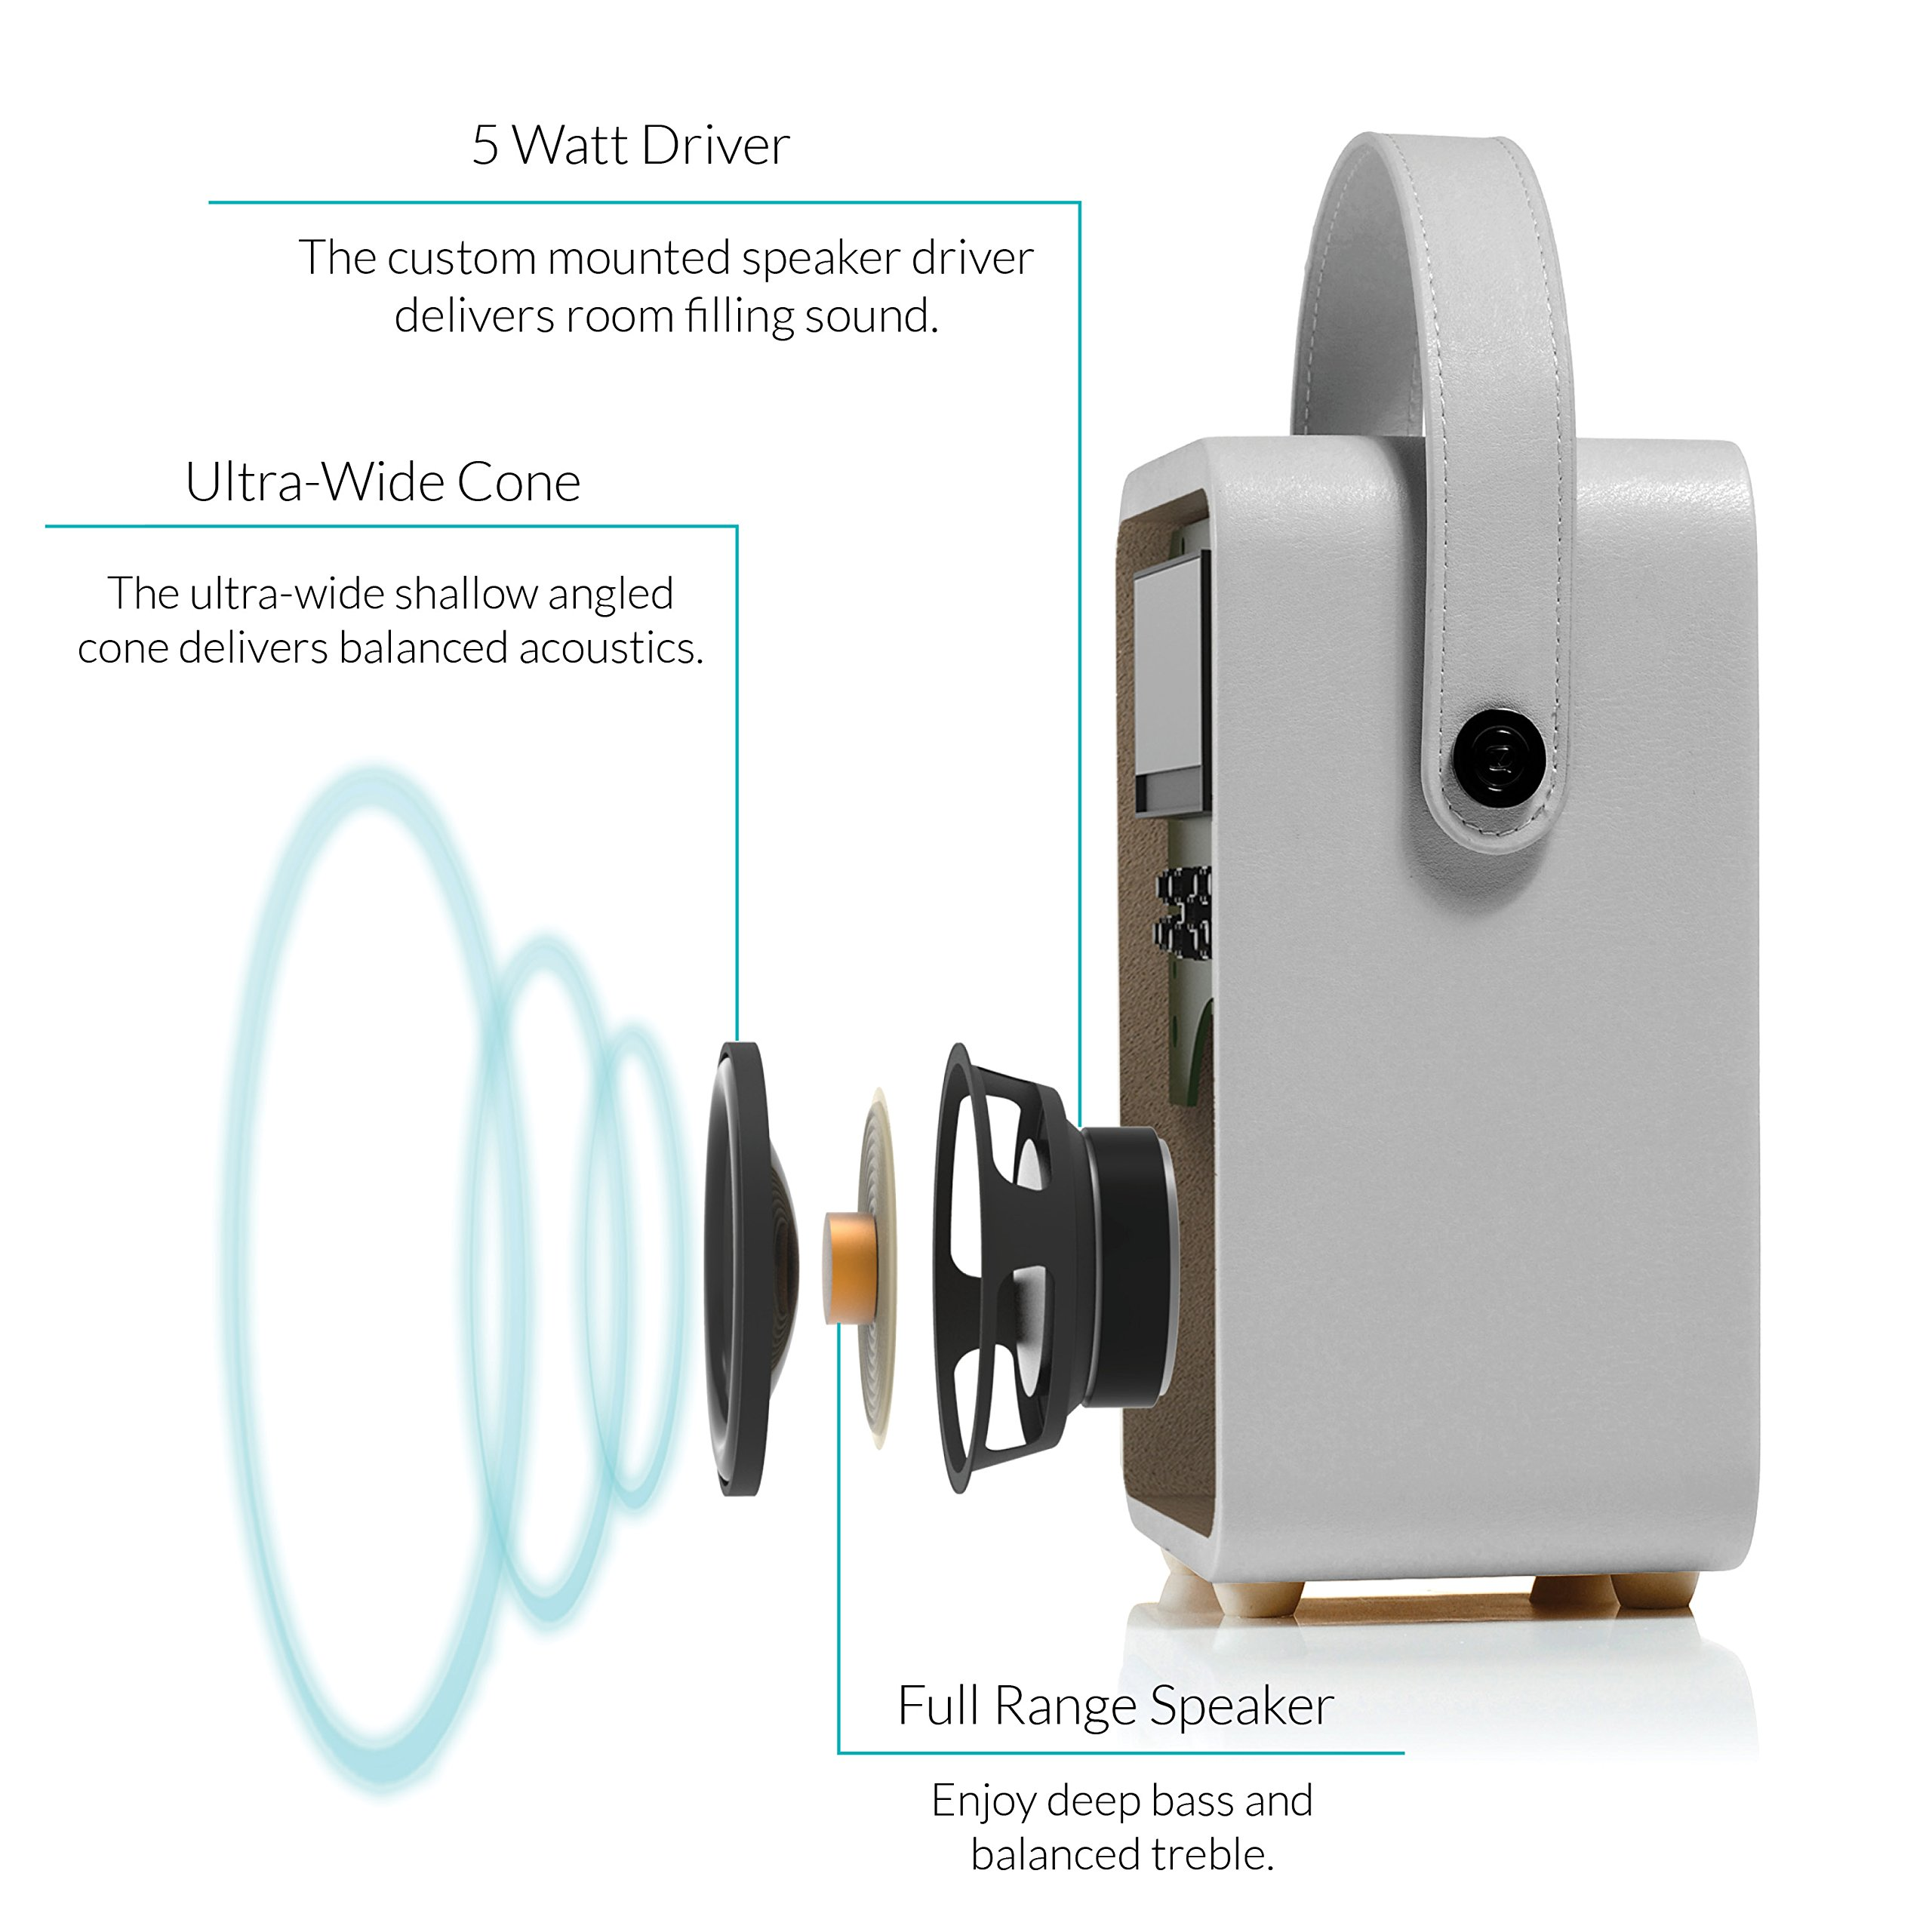 Retro Mini by VQ   Radio & Bluetooth Speaker with AM/FM & HD Radio, Dual Alarm Clock Mains or Battery – Premium PU Leather Case Light Grey by VQ (Image #5)